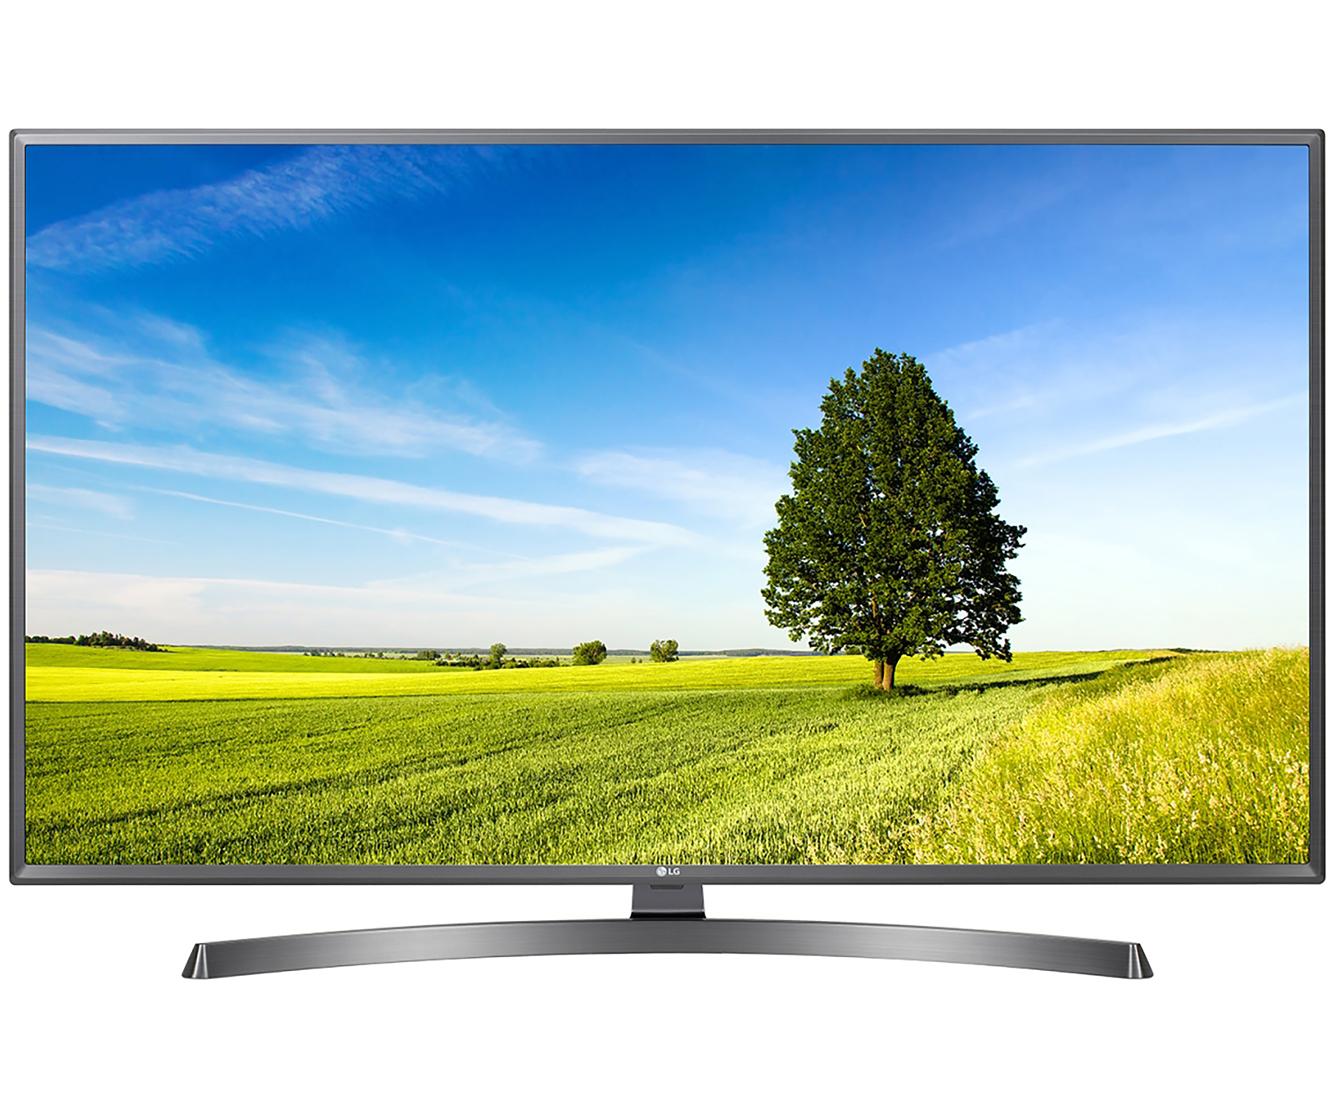 LG 50UK6750PLD 4K Ultra HD TV - 50 inch voor €499 @ AO